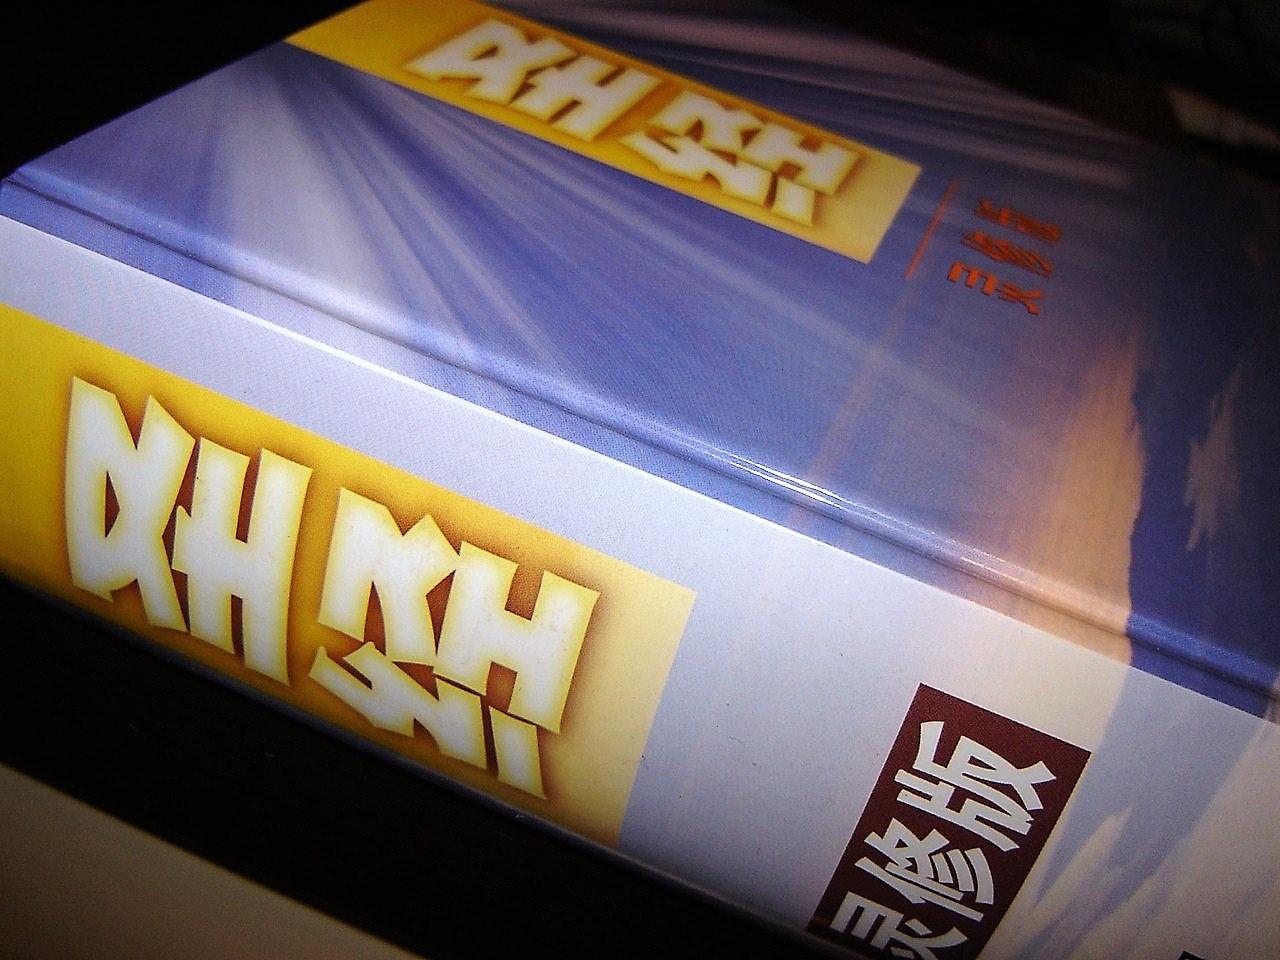 niv life application study bible large print hardcover thumb-indexed